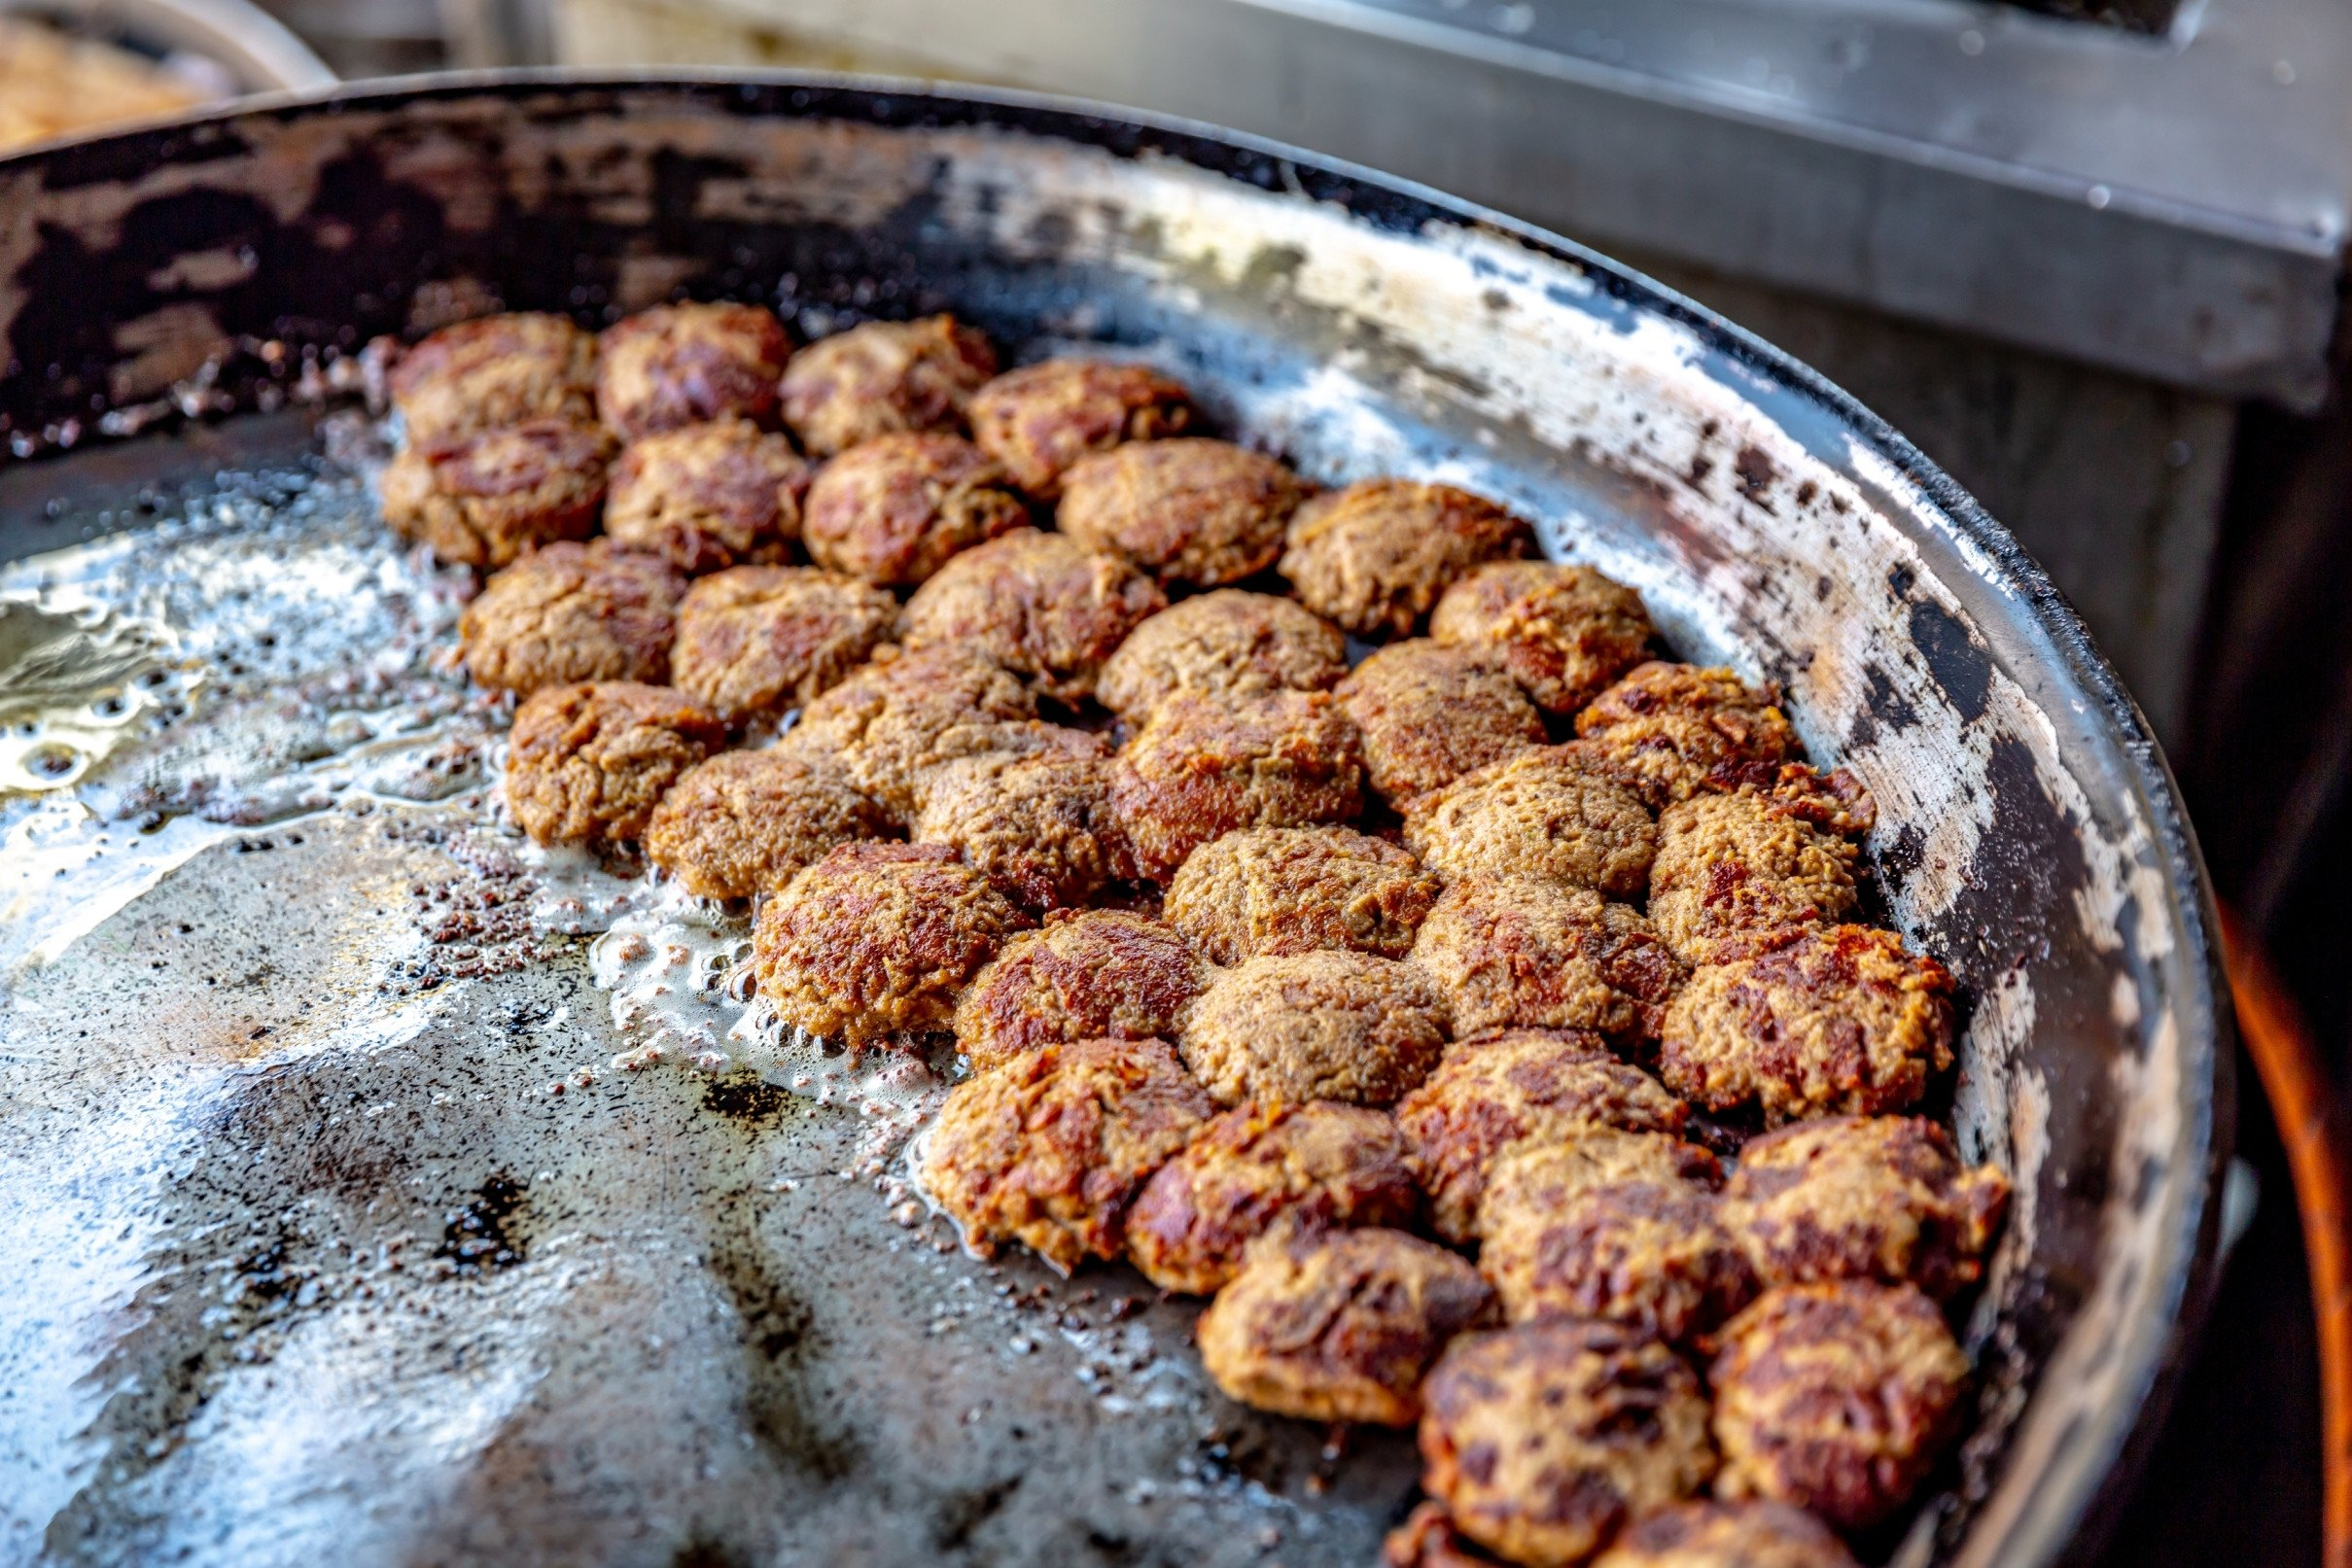 ISUZU X Food Festival Held At Mahalaxmi Race Course